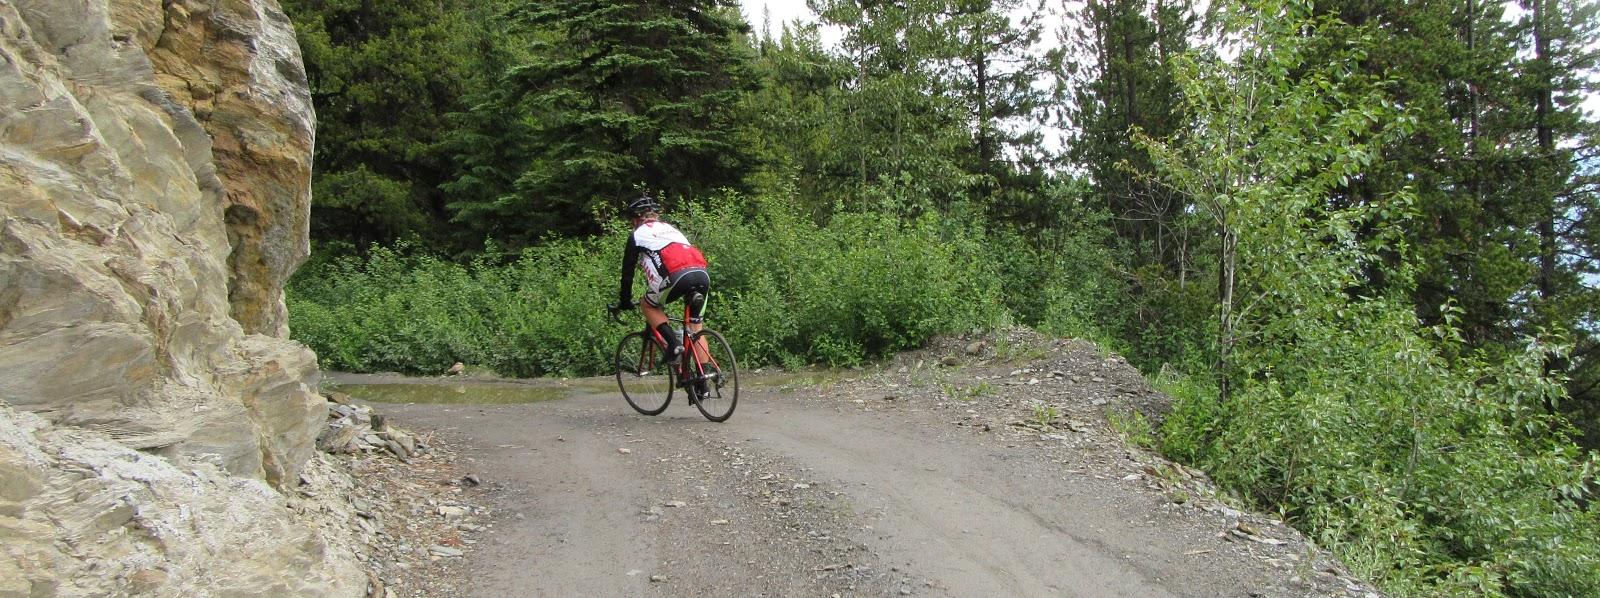 Bike climb of McBride Peak - cyclist on dirt road